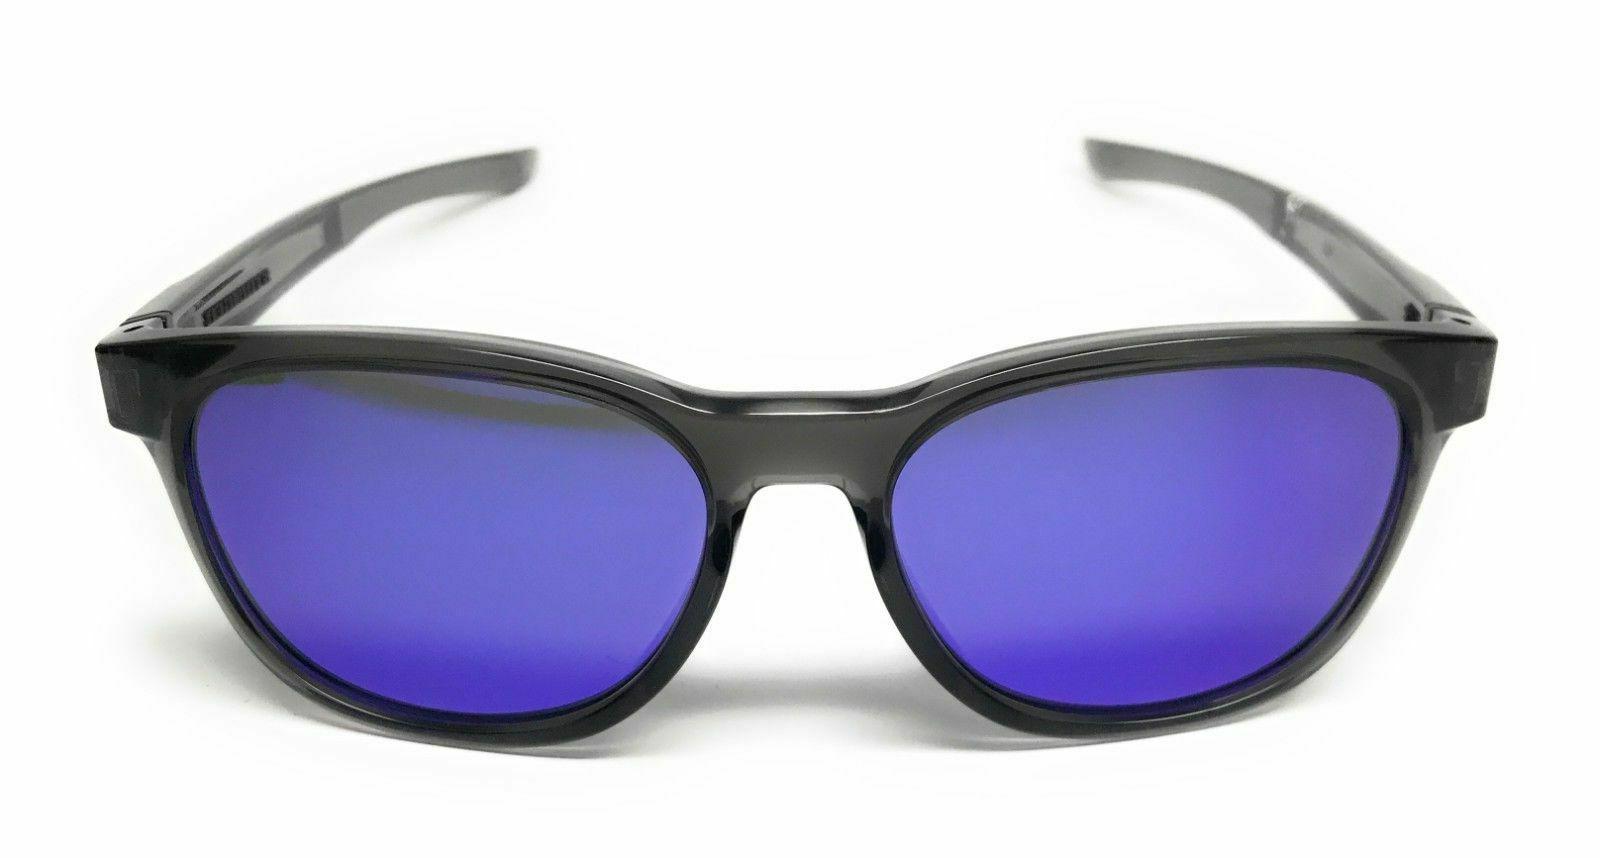 Oakley Sunglasses OO9315-05 Grey Frame Violet Iridium Lens